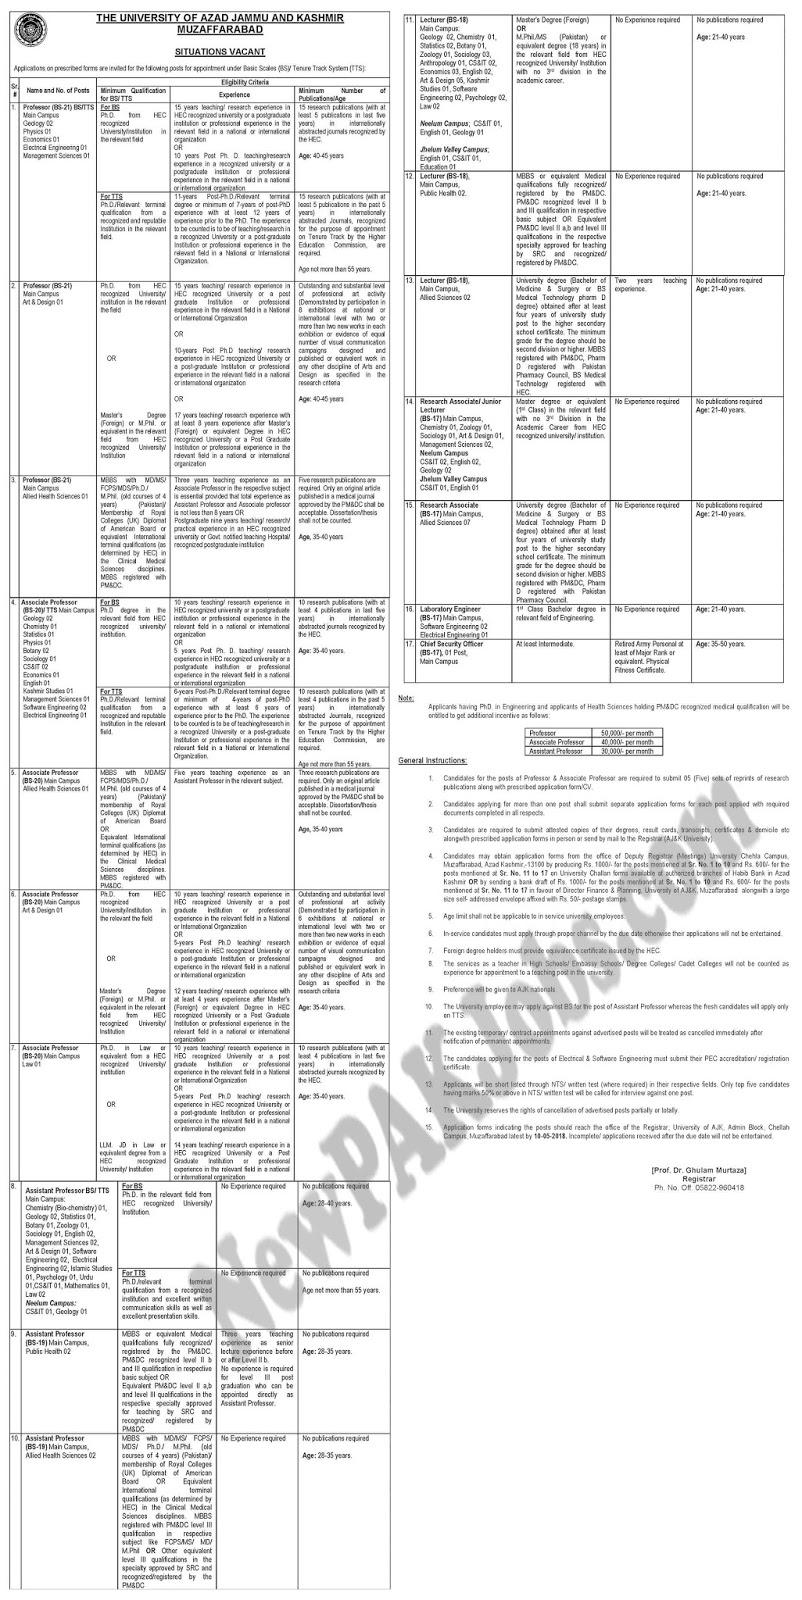 Latest Ajk 2018 Jobs in The University of Azad Jammu Kashmir (120+ Posts)